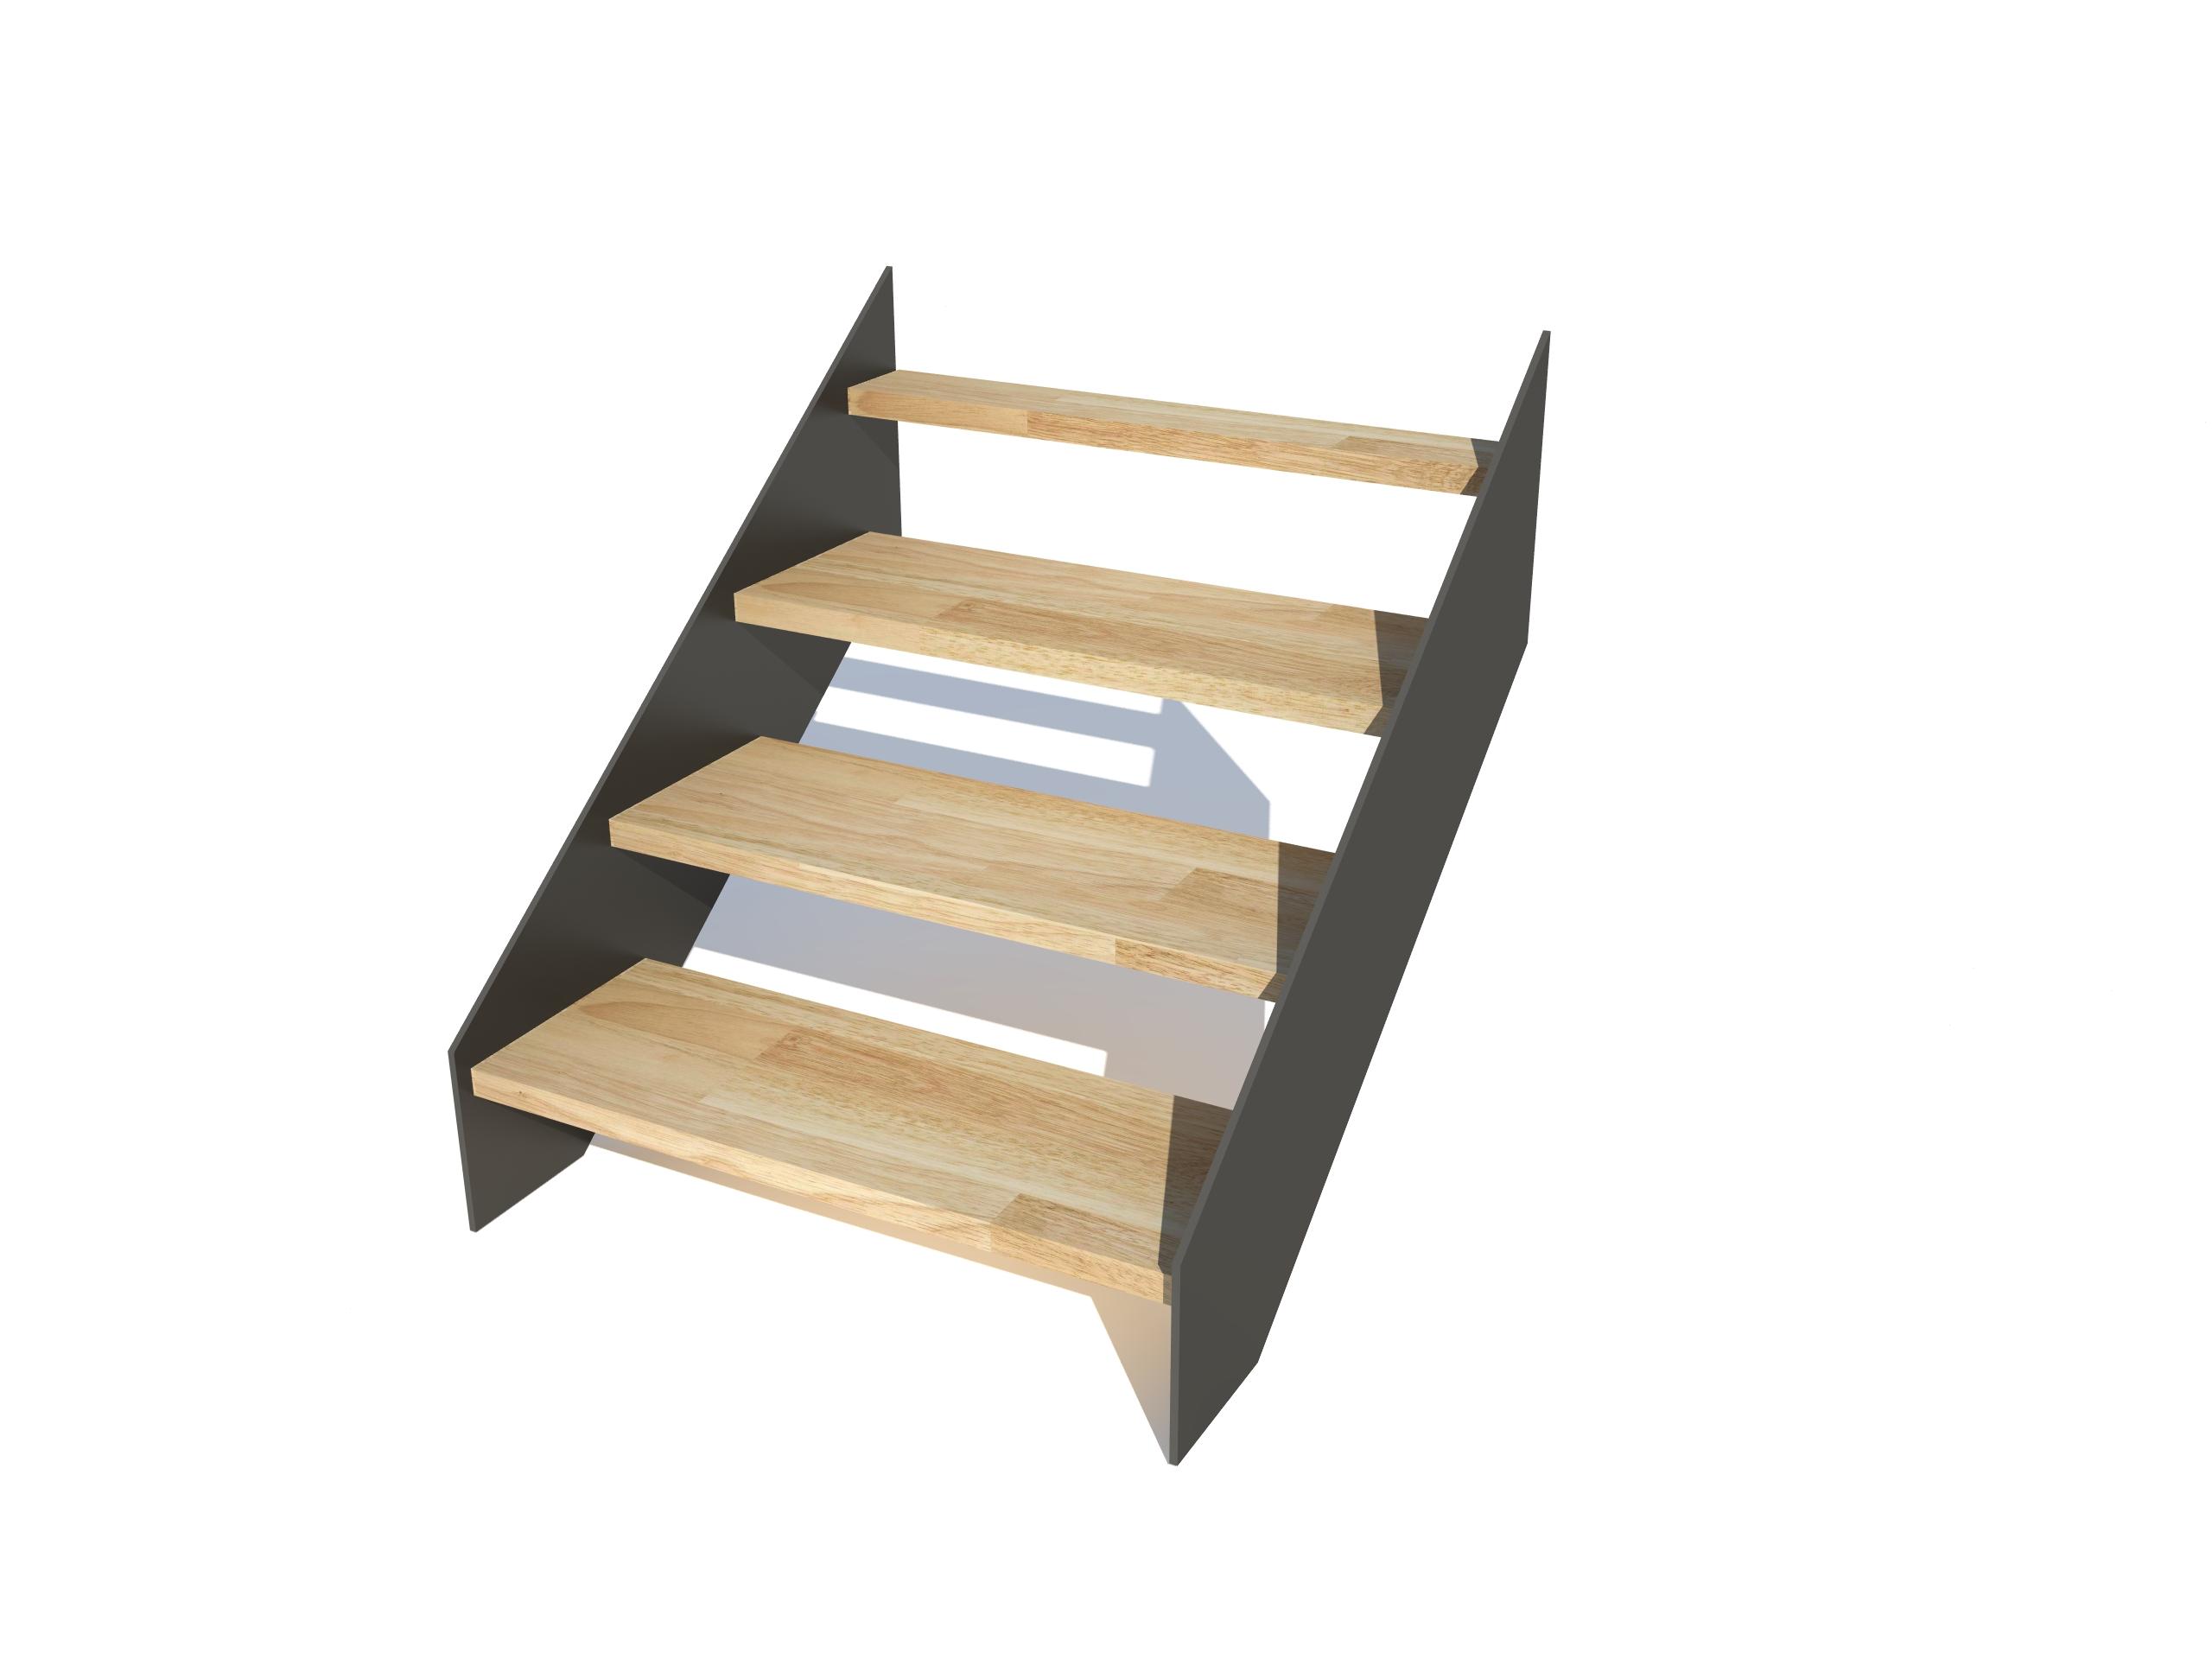 escalier 3 marches metal sans with escalier 3 marches. Black Bedroom Furniture Sets. Home Design Ideas